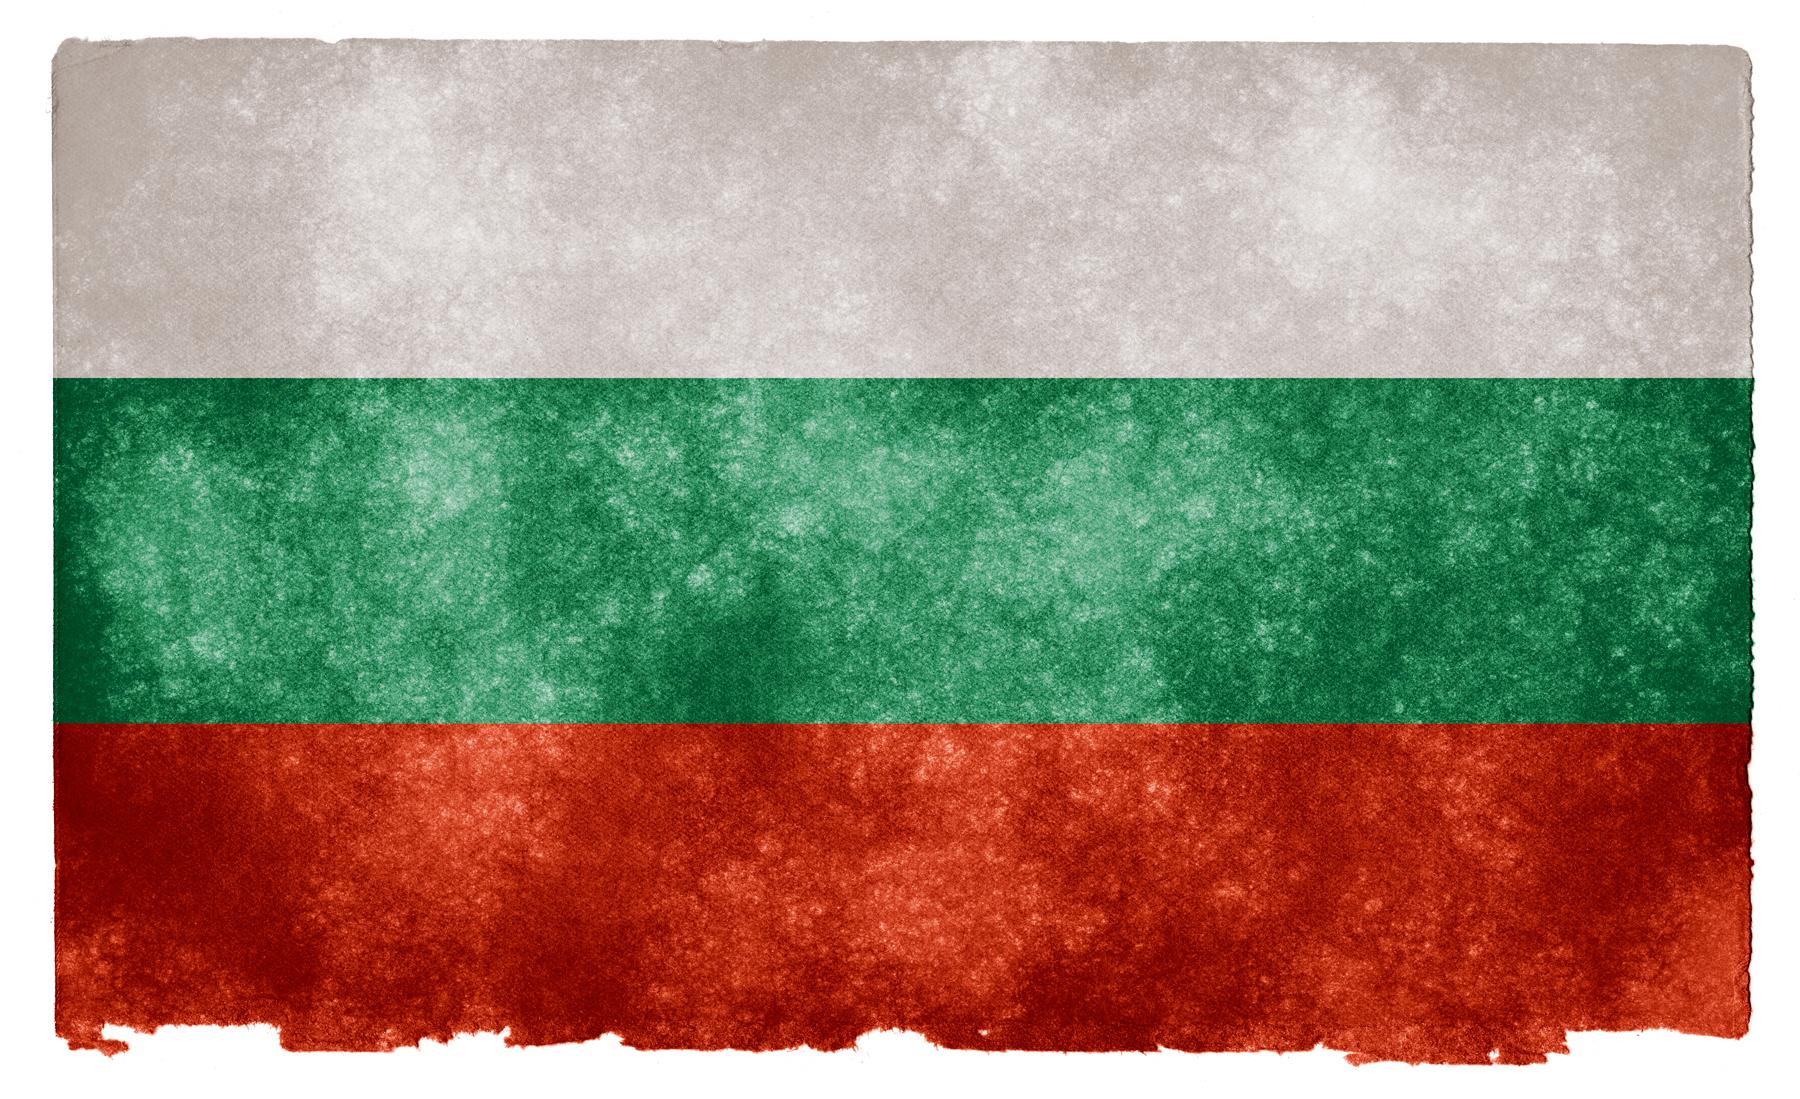 Bulgaria Grunge Flag, Aged, Resource, National, Old, HQ Photo